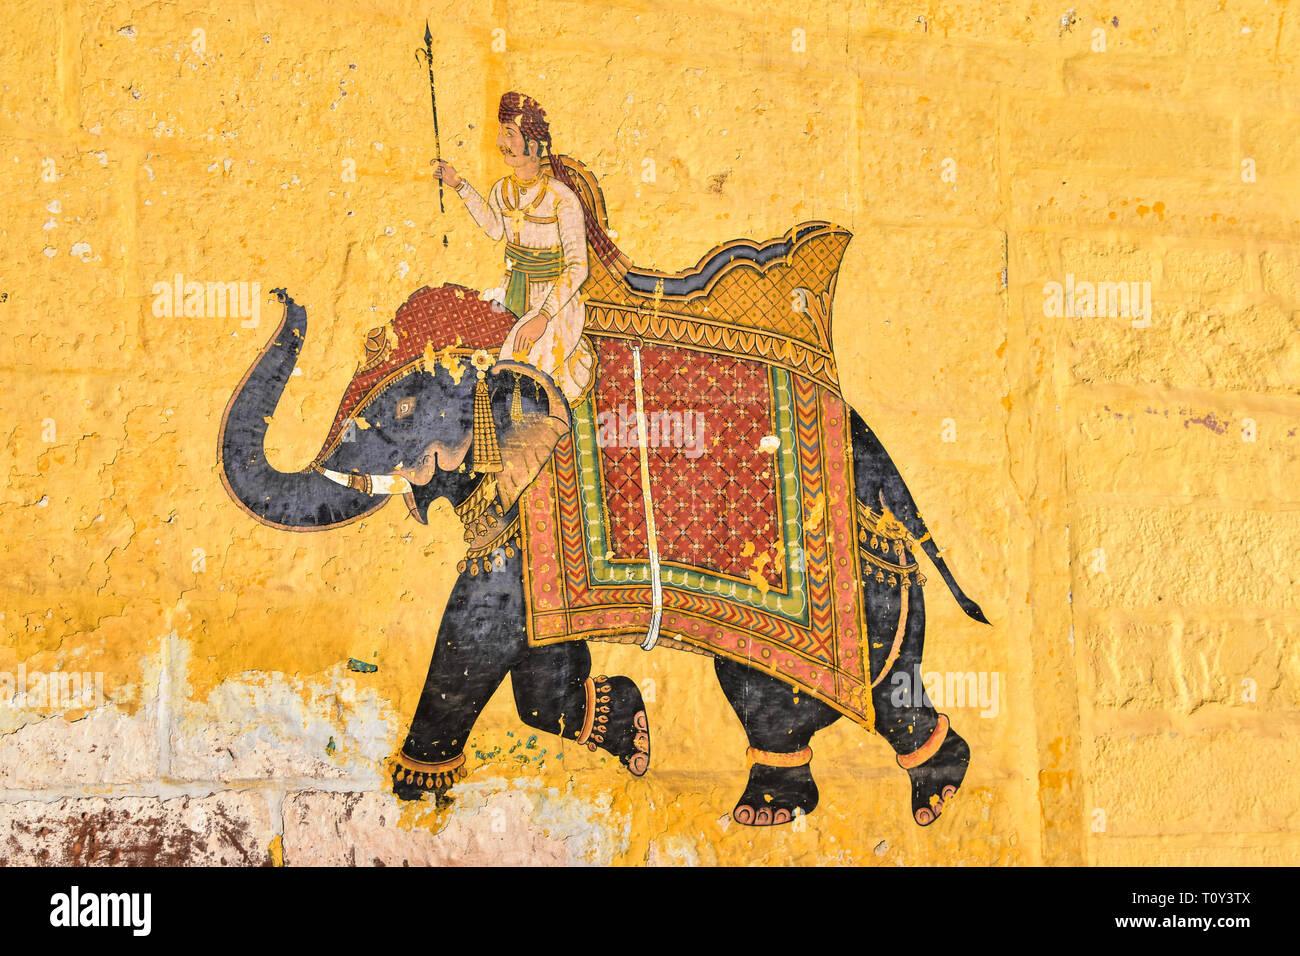 Elephant Mural, Pal Haveli, Jodhpur, Rajasthan, India - Stock Image